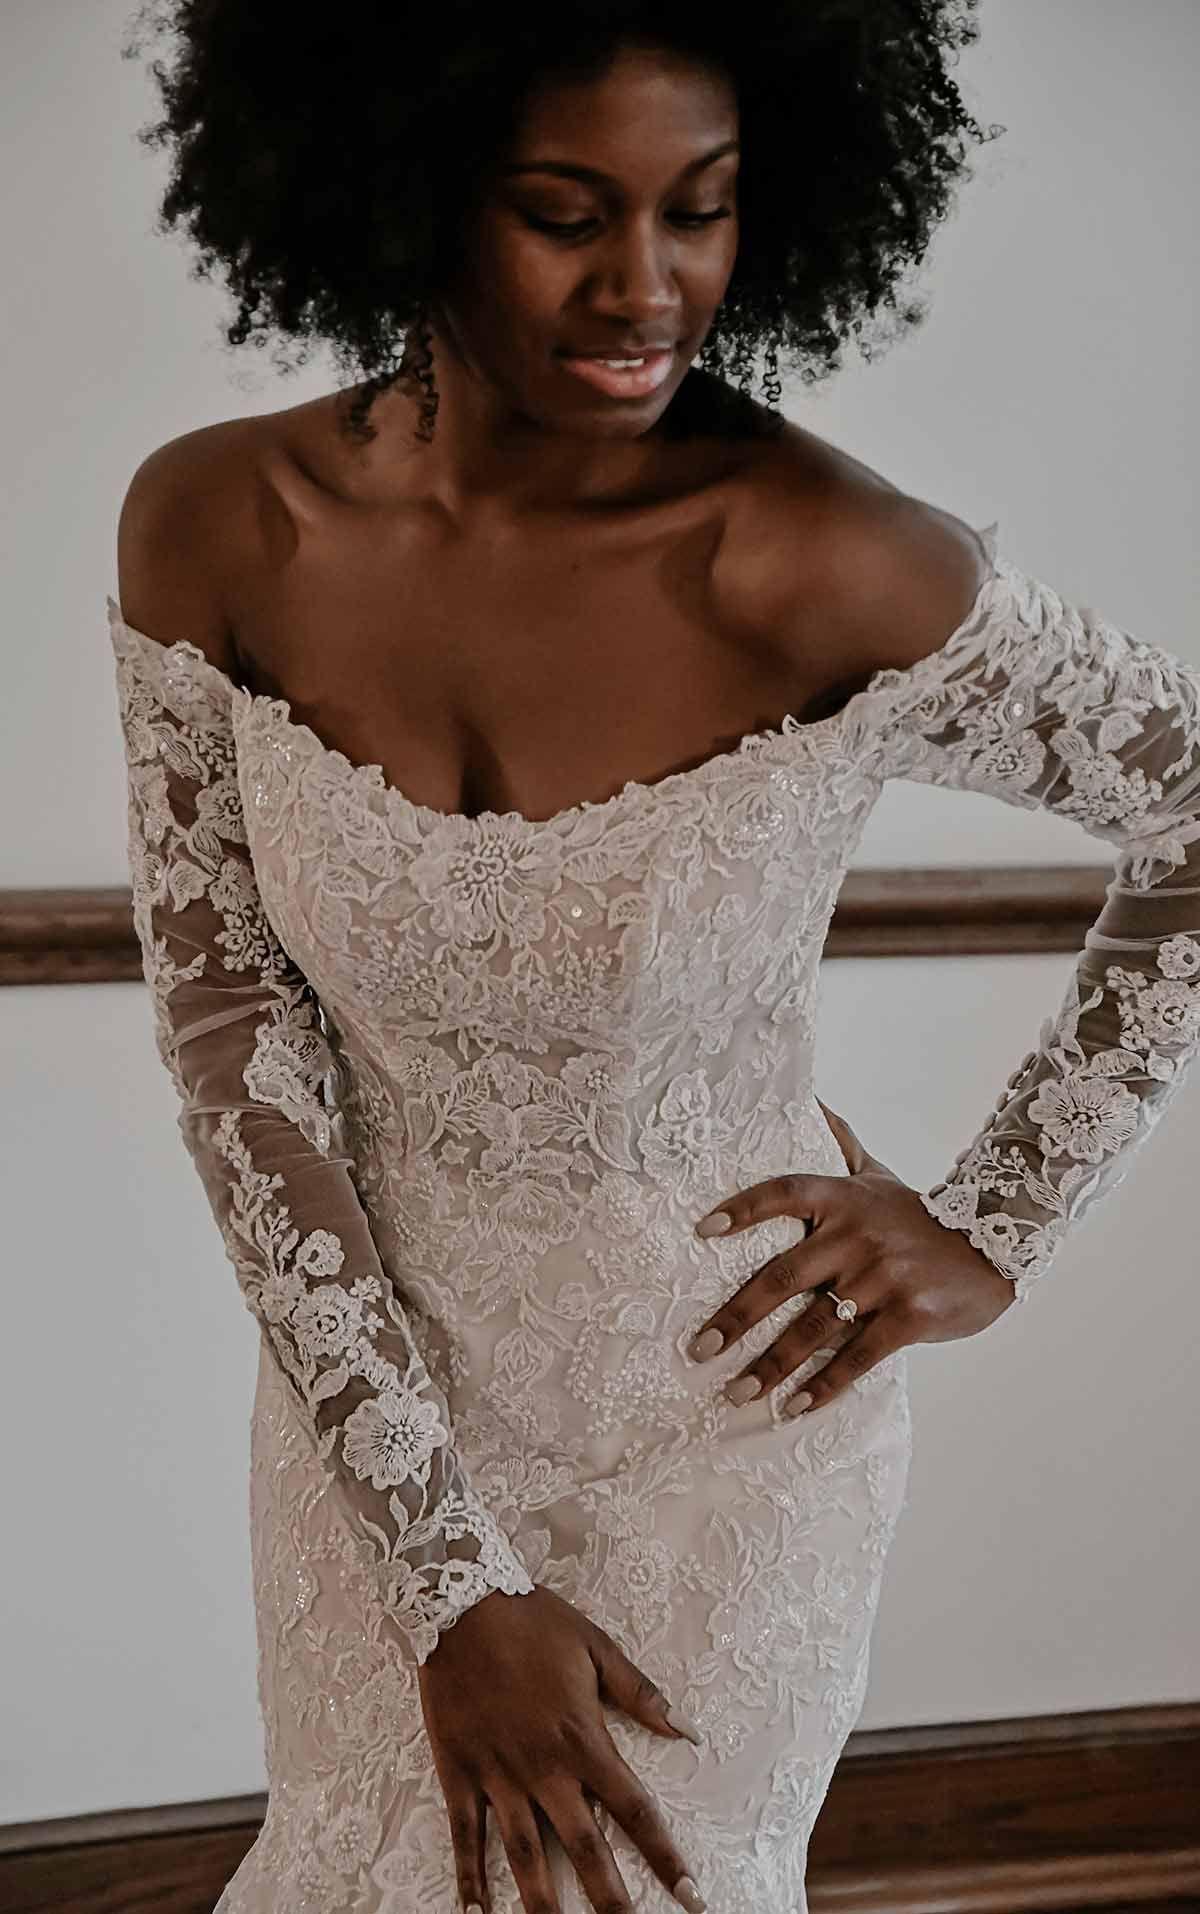 Off Shoulder Mermaid Wedding Dress With Lace Sleeves Essense Of Australia Wedding Dresses Wedding Dress Long Sleeve Essense Of Australia Wedding Dresses Stunning Bridesmaid Dresses [ 1914 x 1200 Pixel ]